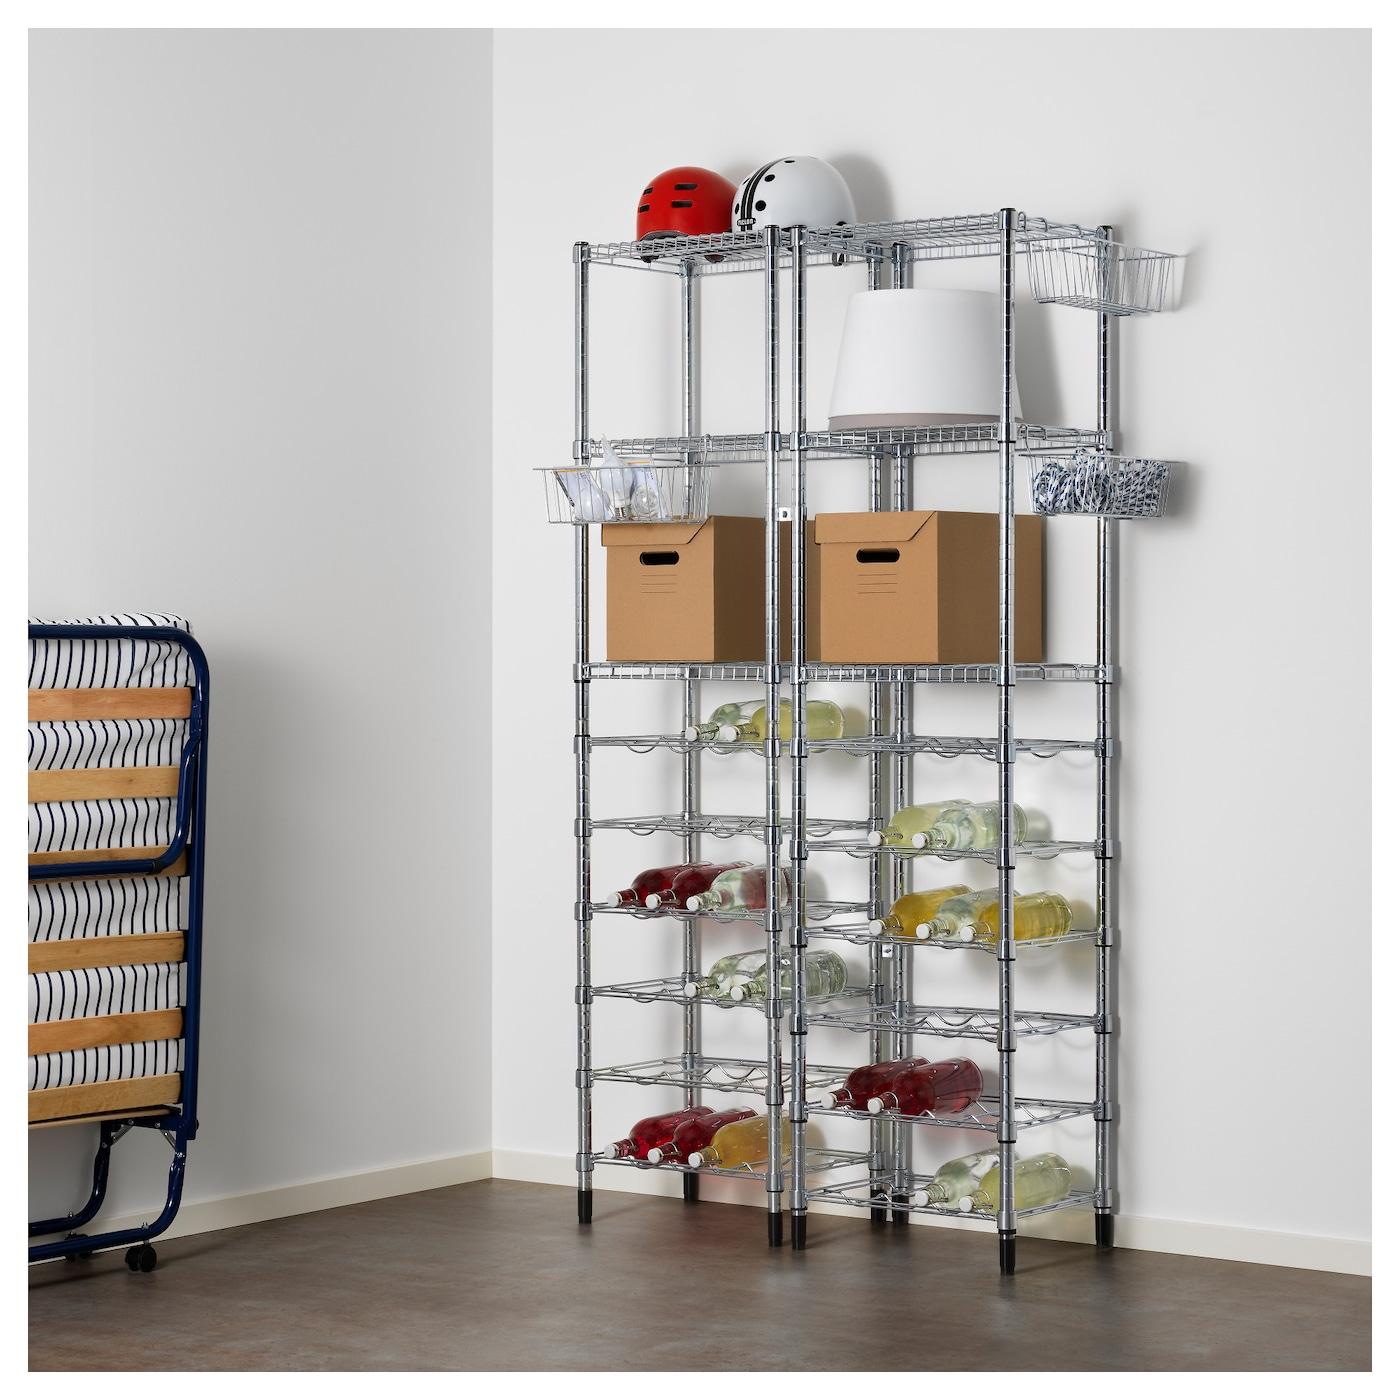 Pantry Storage Shelving Units Small Metal Shelving Unit: OMAR 2 Shelf Sections 107x36x181 Cm